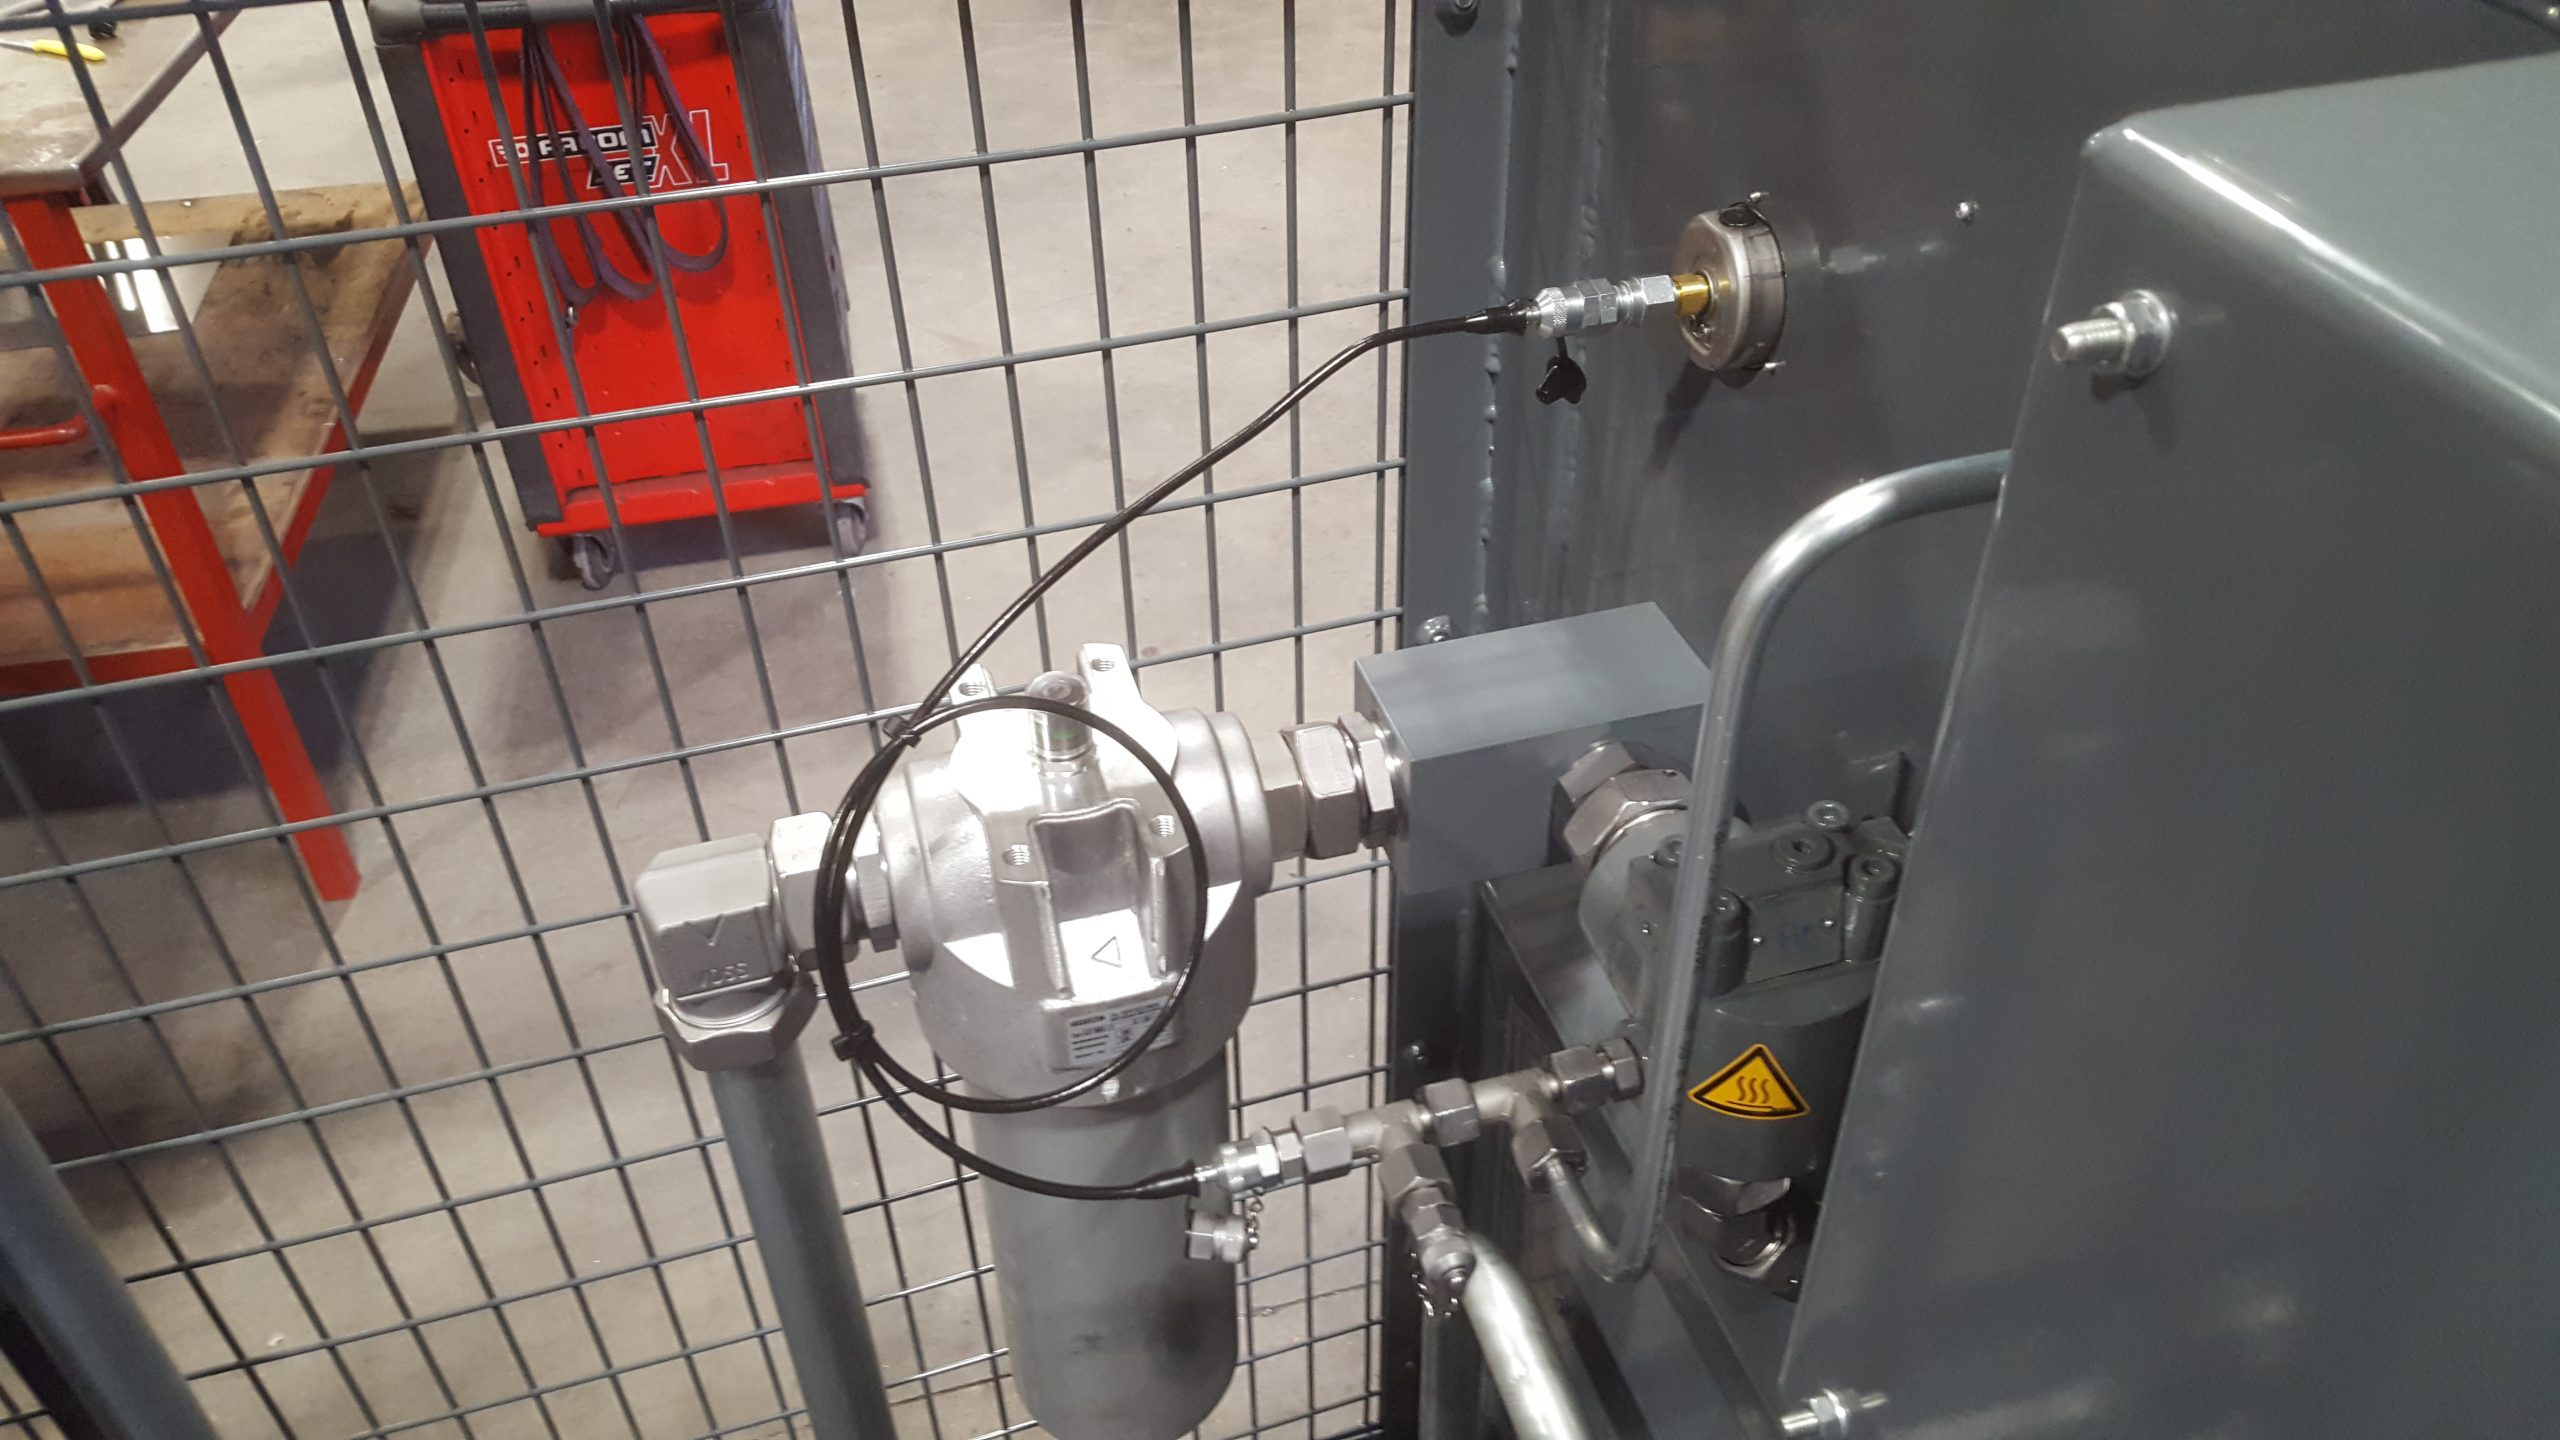 Skid dynamometer